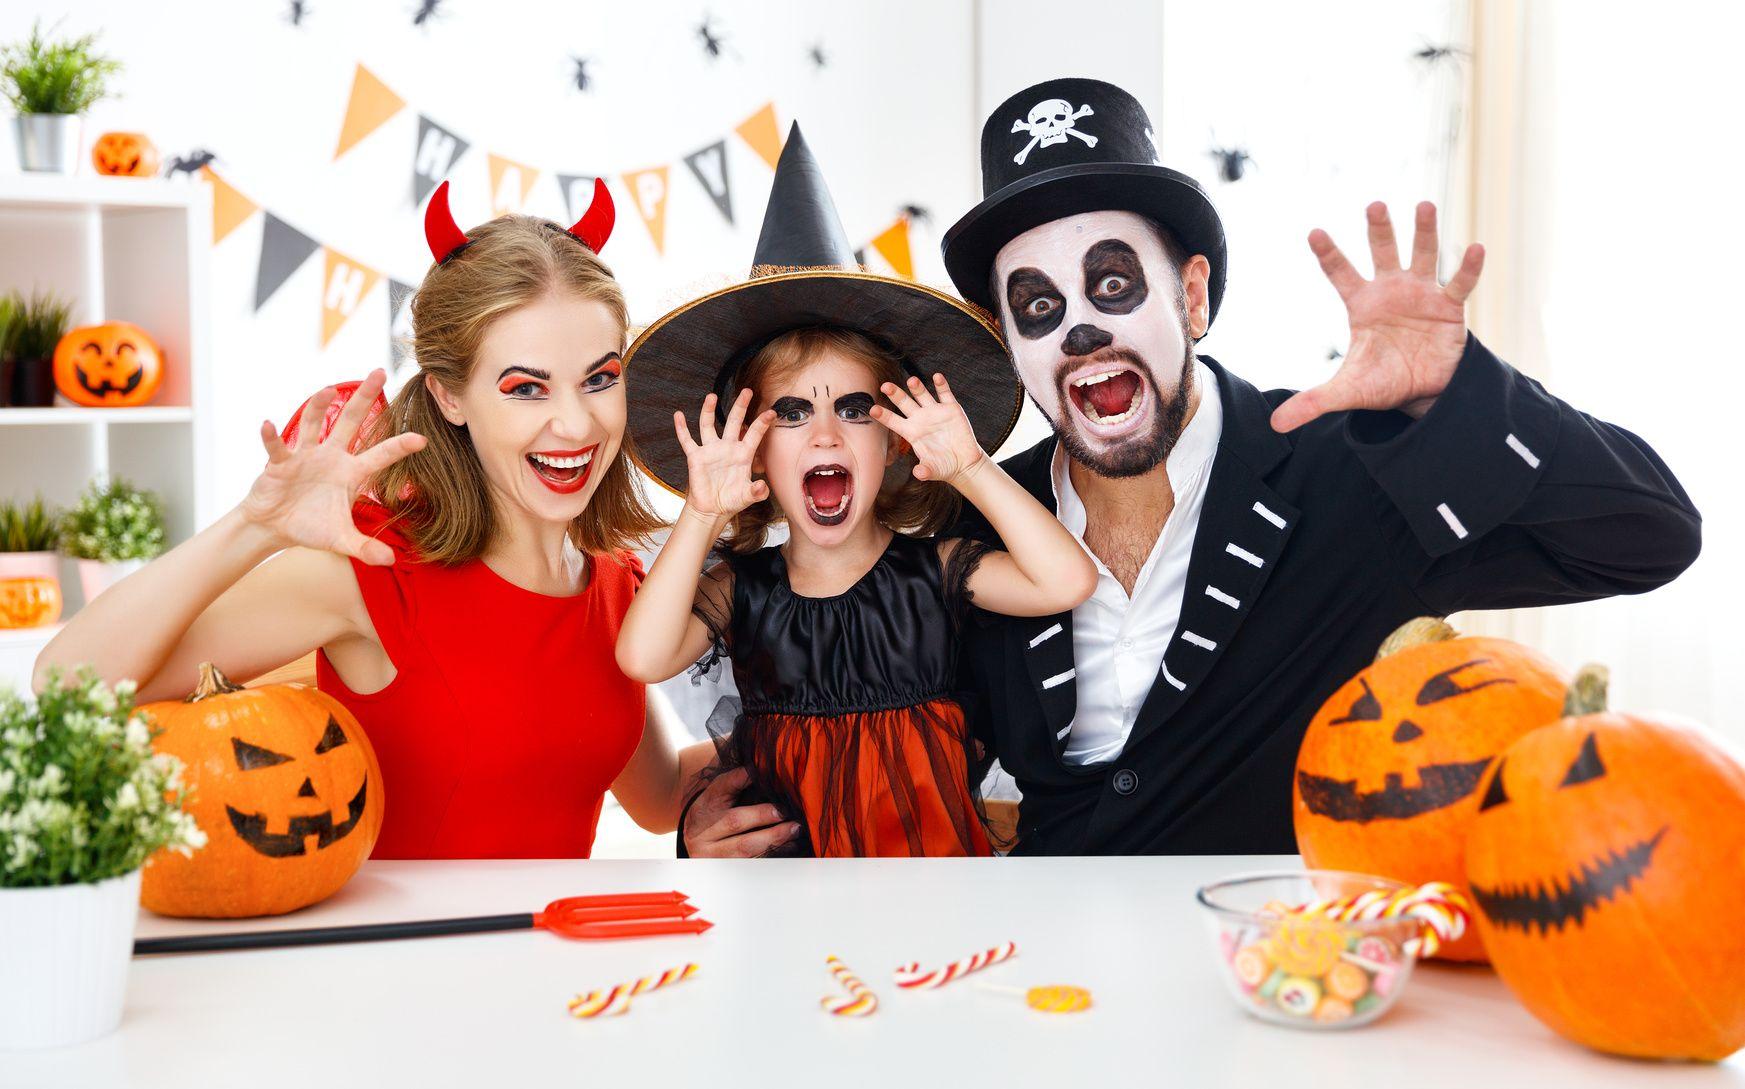 Joyeux Halloween 2019 Halloween Costumes Codes Promo Halloween Traditions Halloween Halloween Countdown